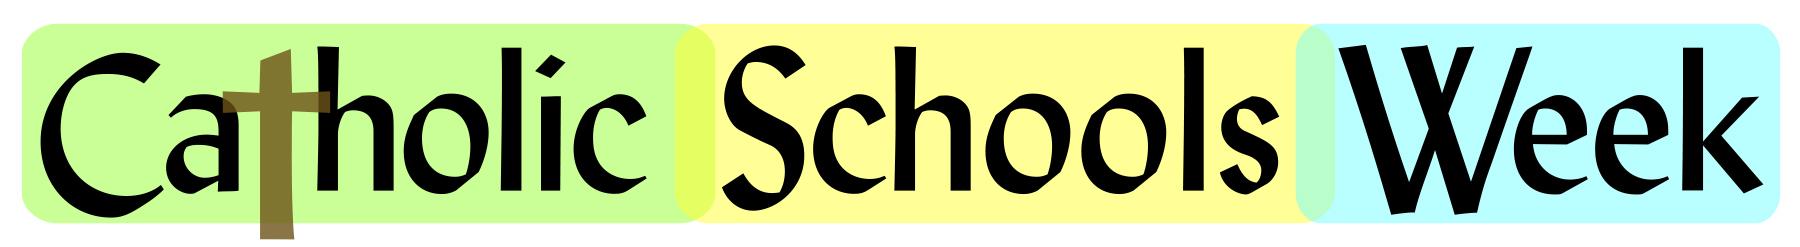 6460 Catholic Schools Week Celebrations on Parent Involvement Articles